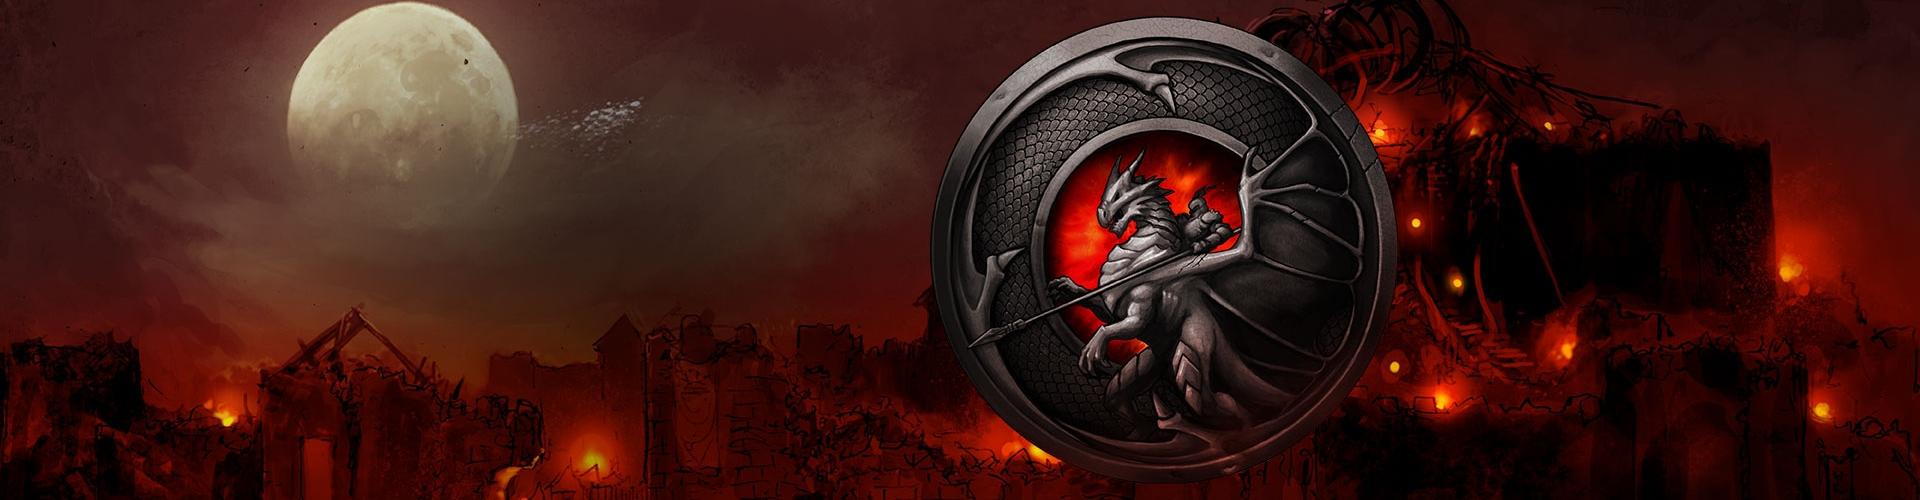 Pre-Order Siege of Dragonspear